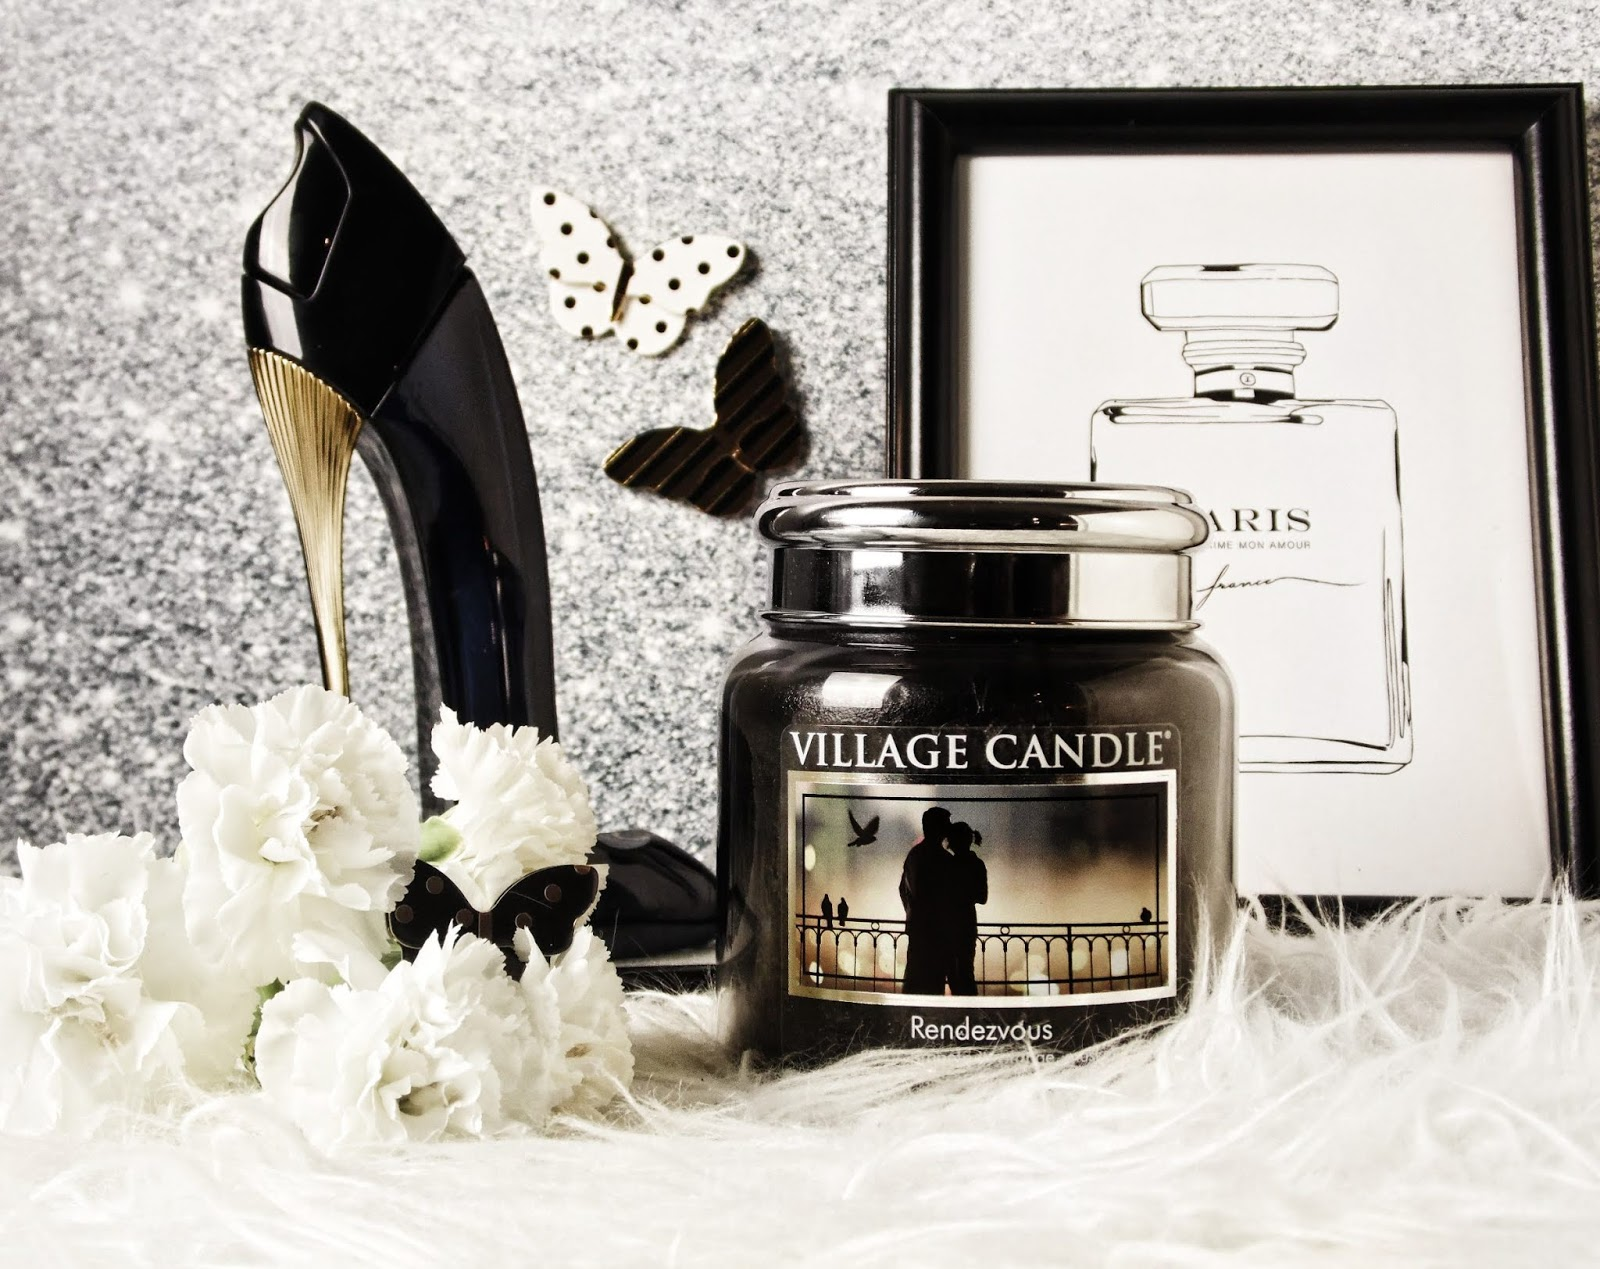 village candle rendezvous silver lid recenzja carolina herrera good girl blog perfumy świeca świeczka